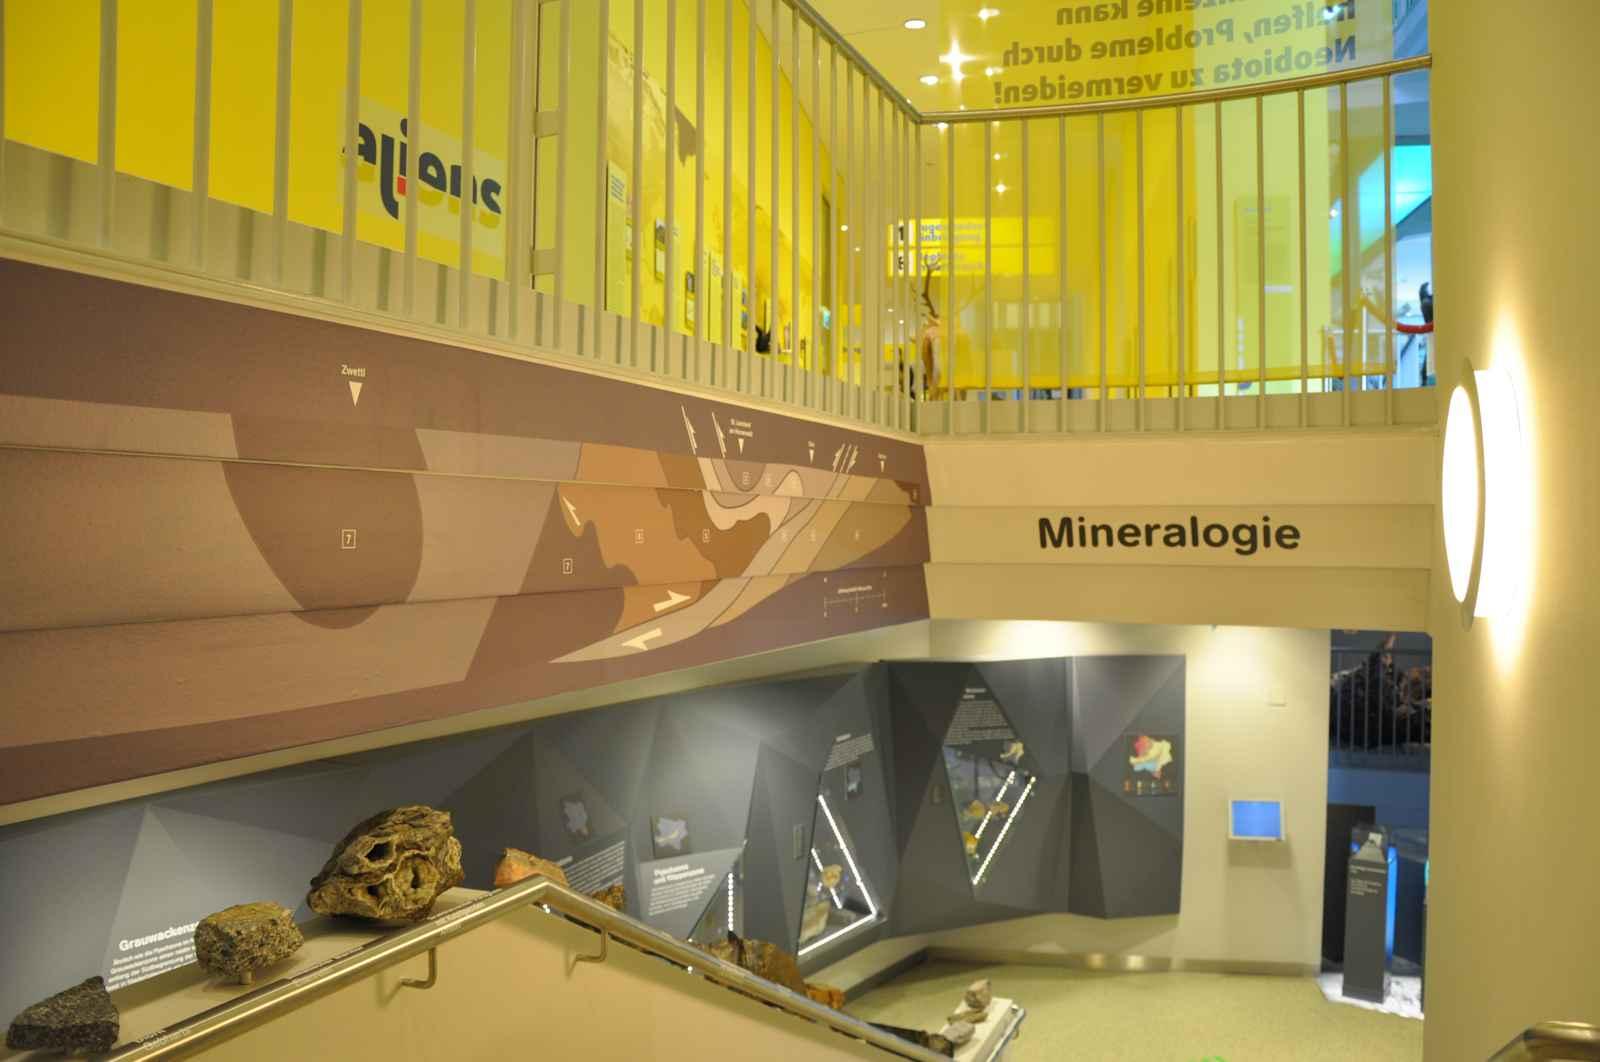 Abgang zur Mineralogie